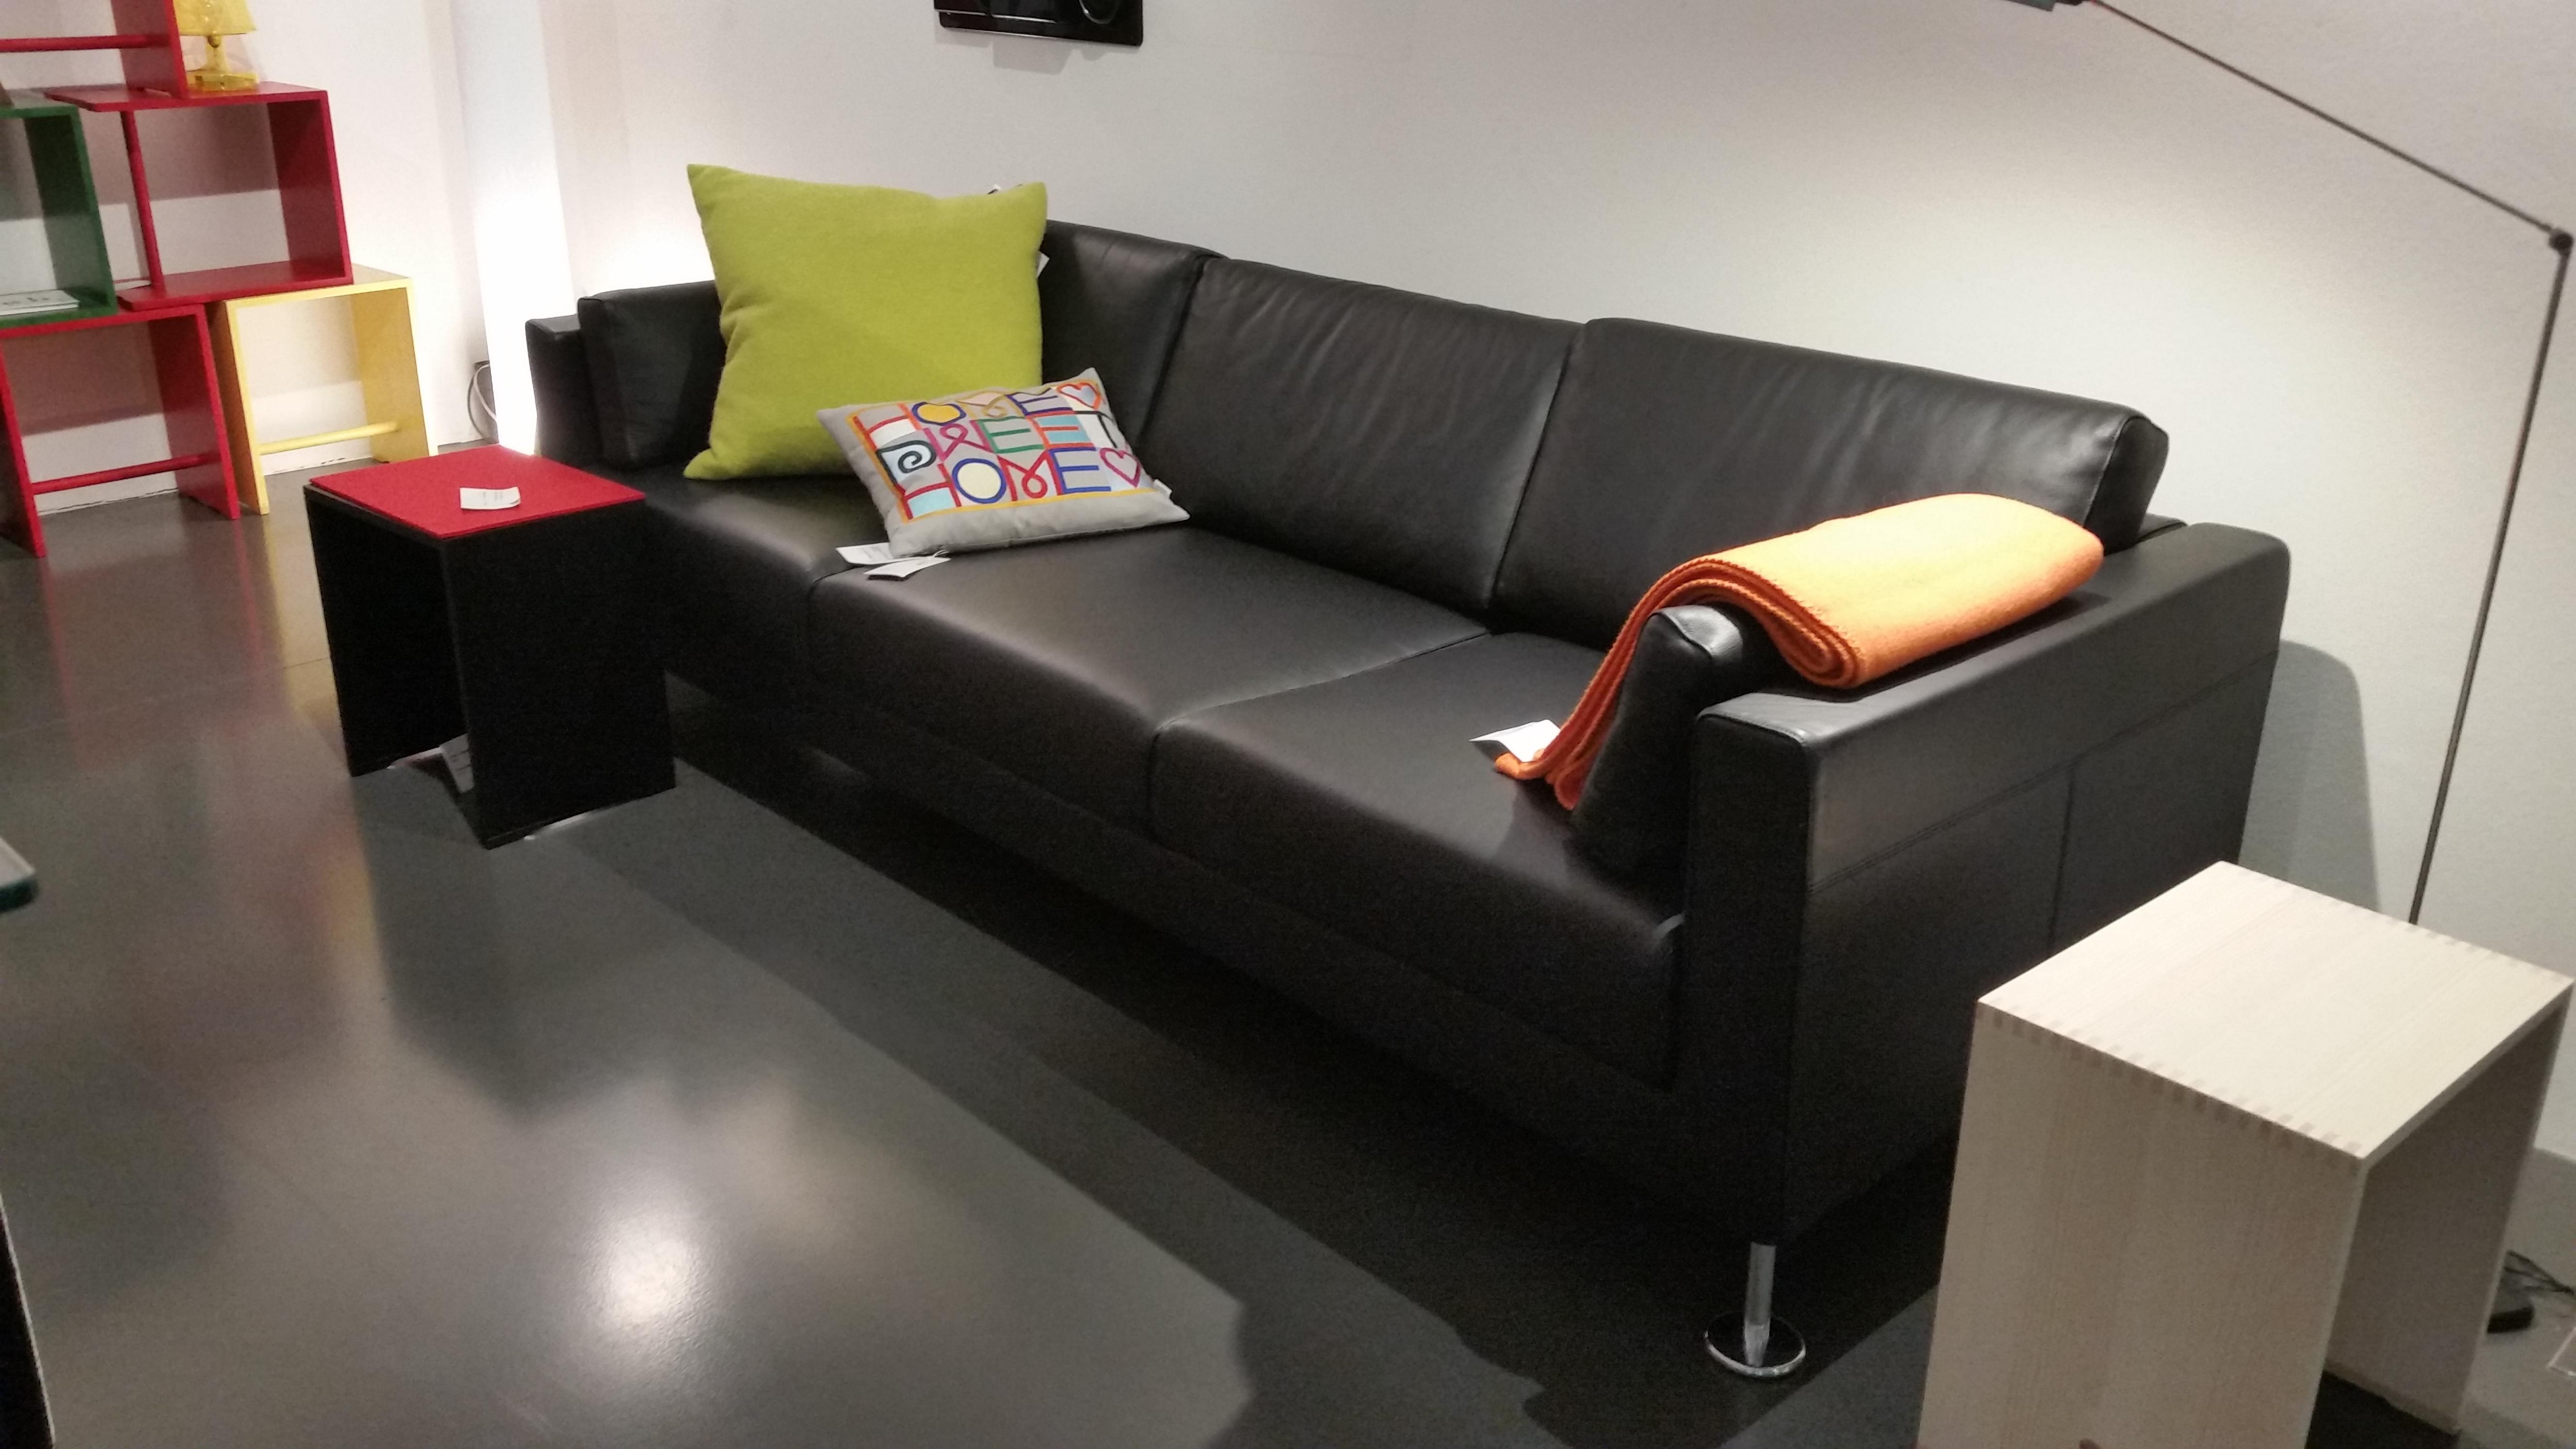 Design outlet und lagerverkauf im wohnbedarf basel for Ledersofa lagerverkauf